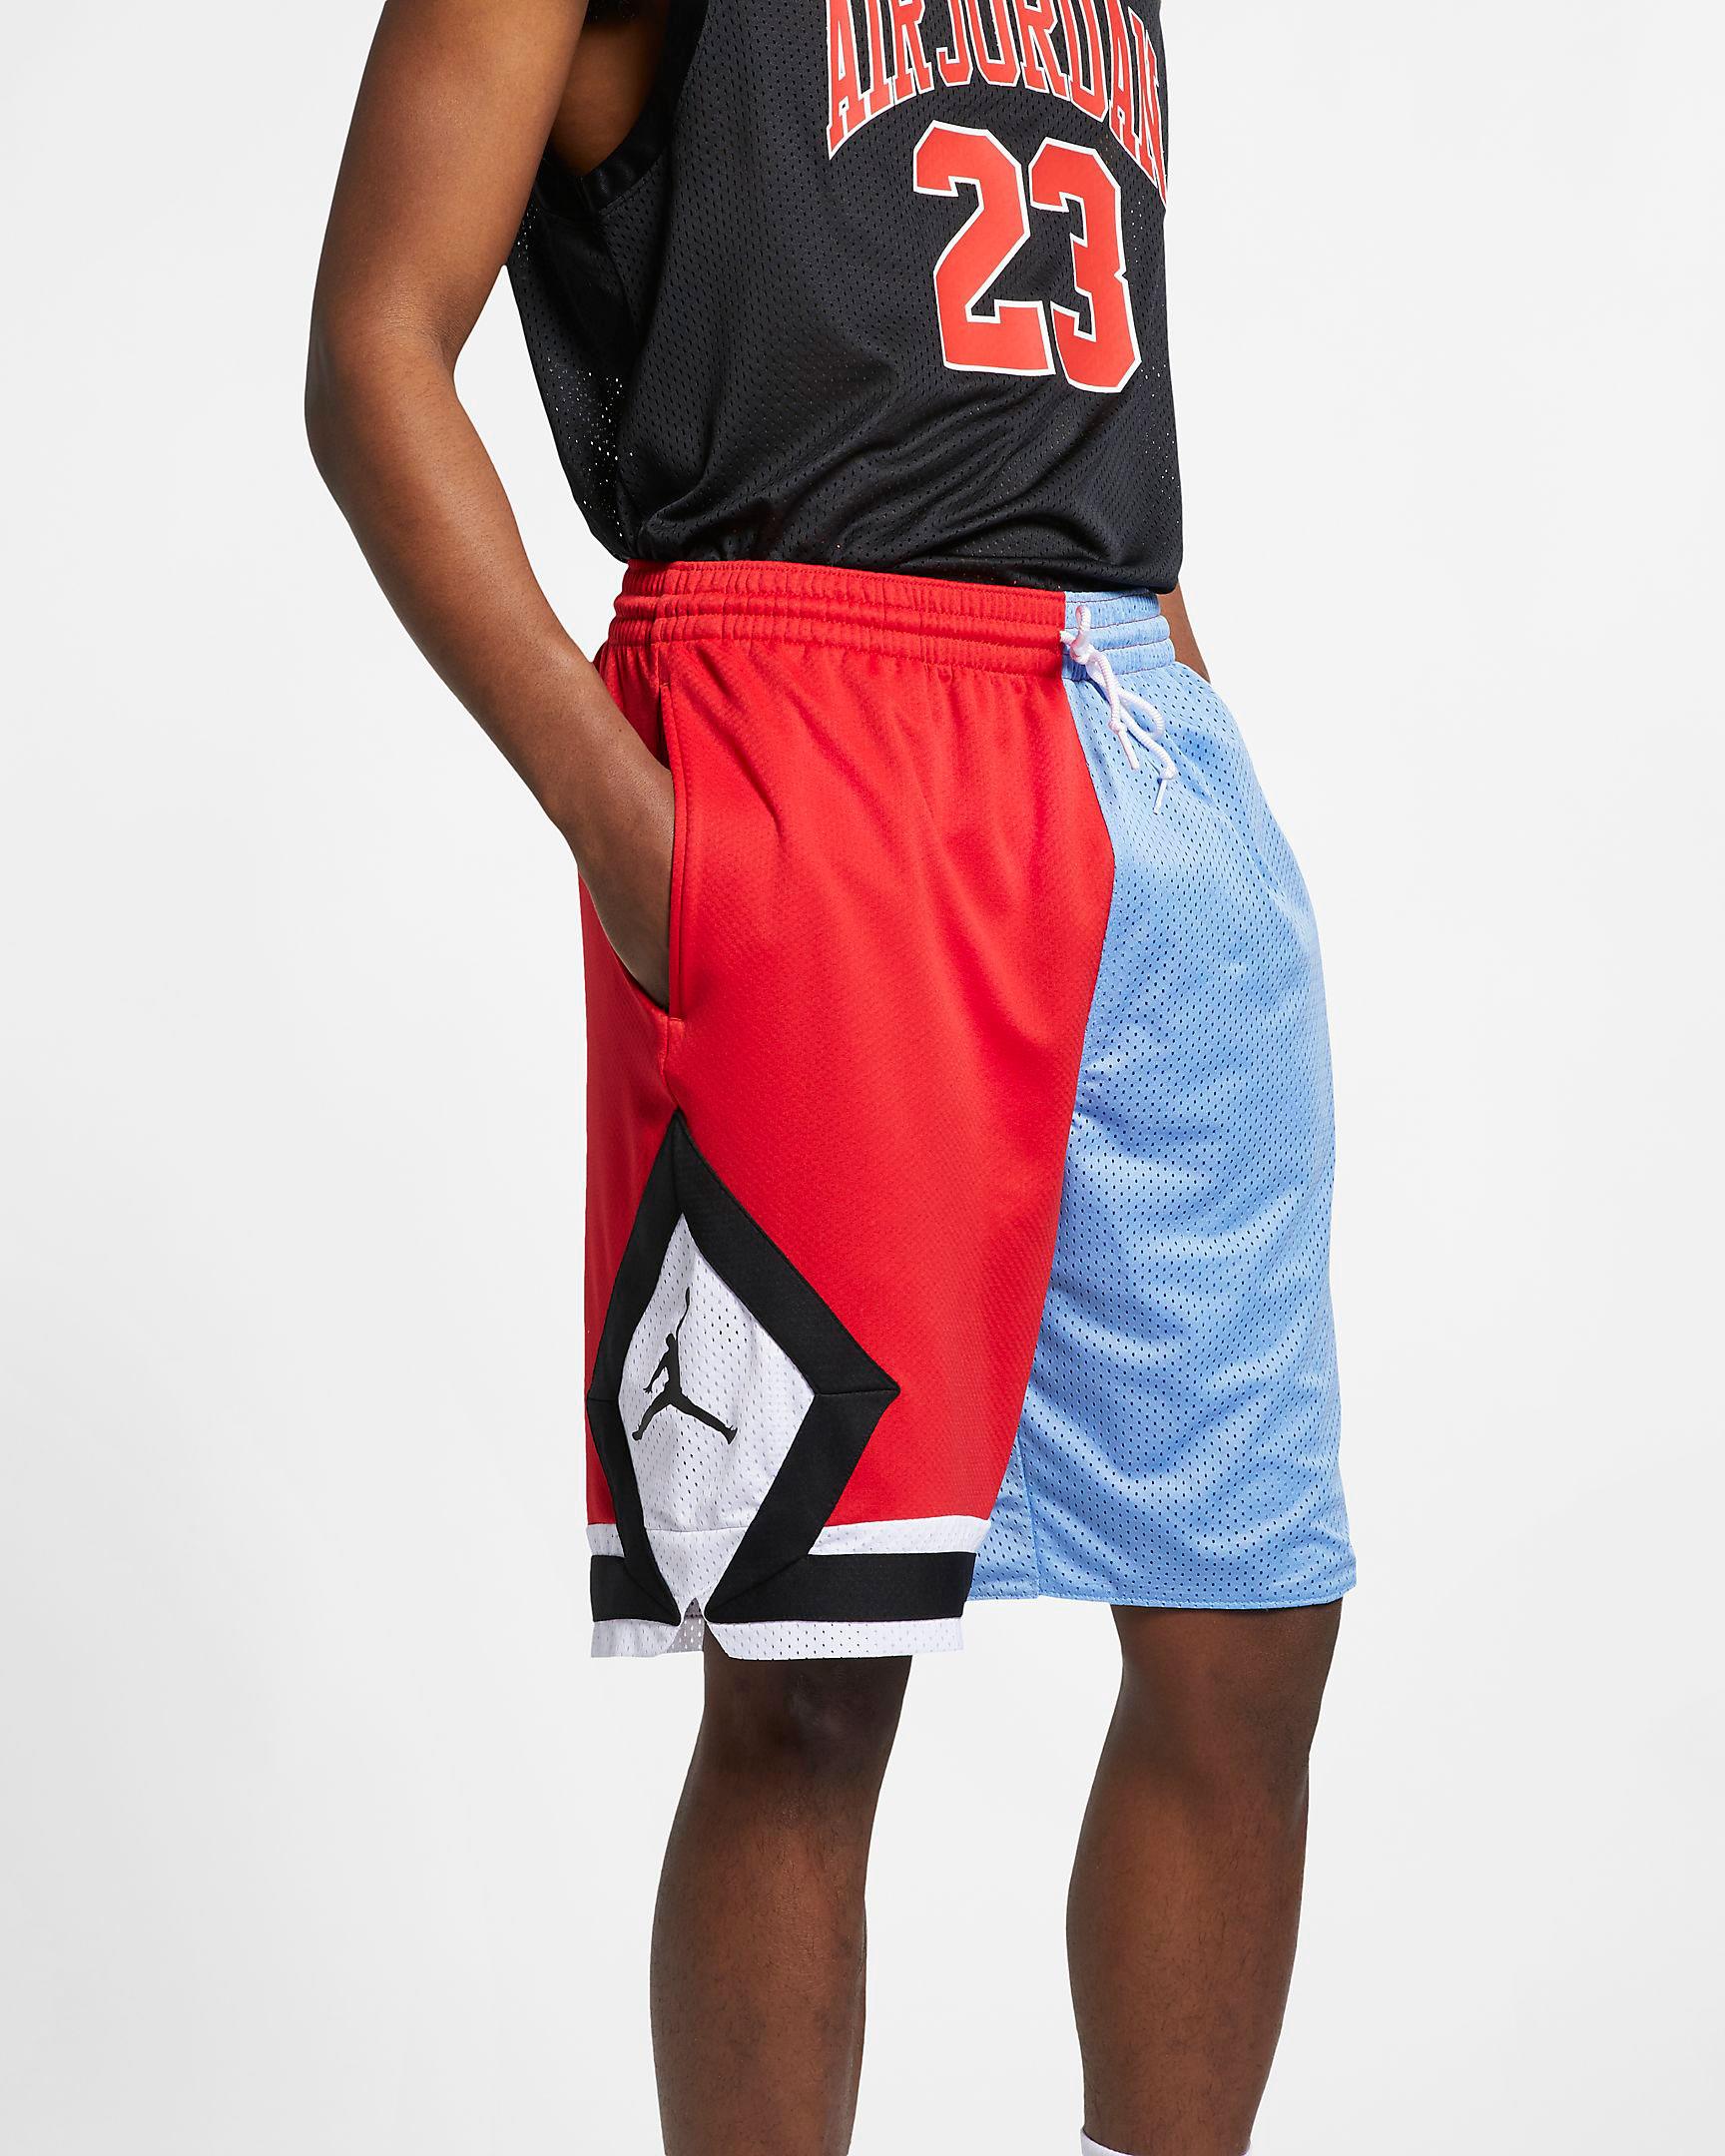 jordan-4-bred-shorts-match-1